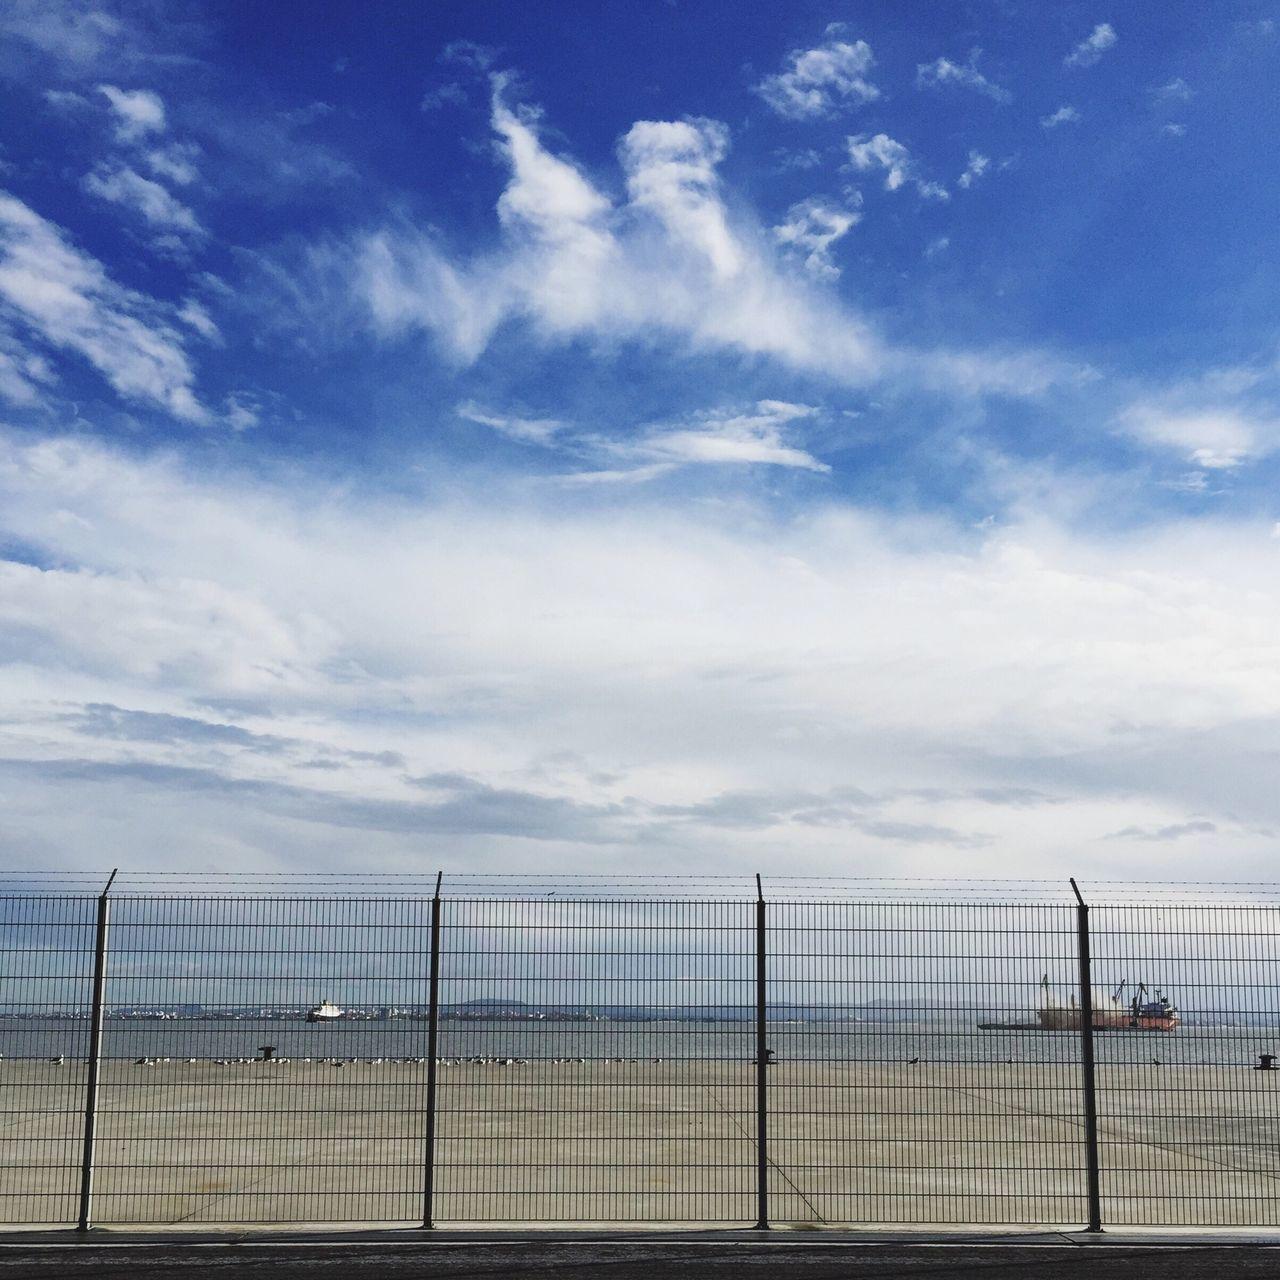 Fence On Harbor Against Sky